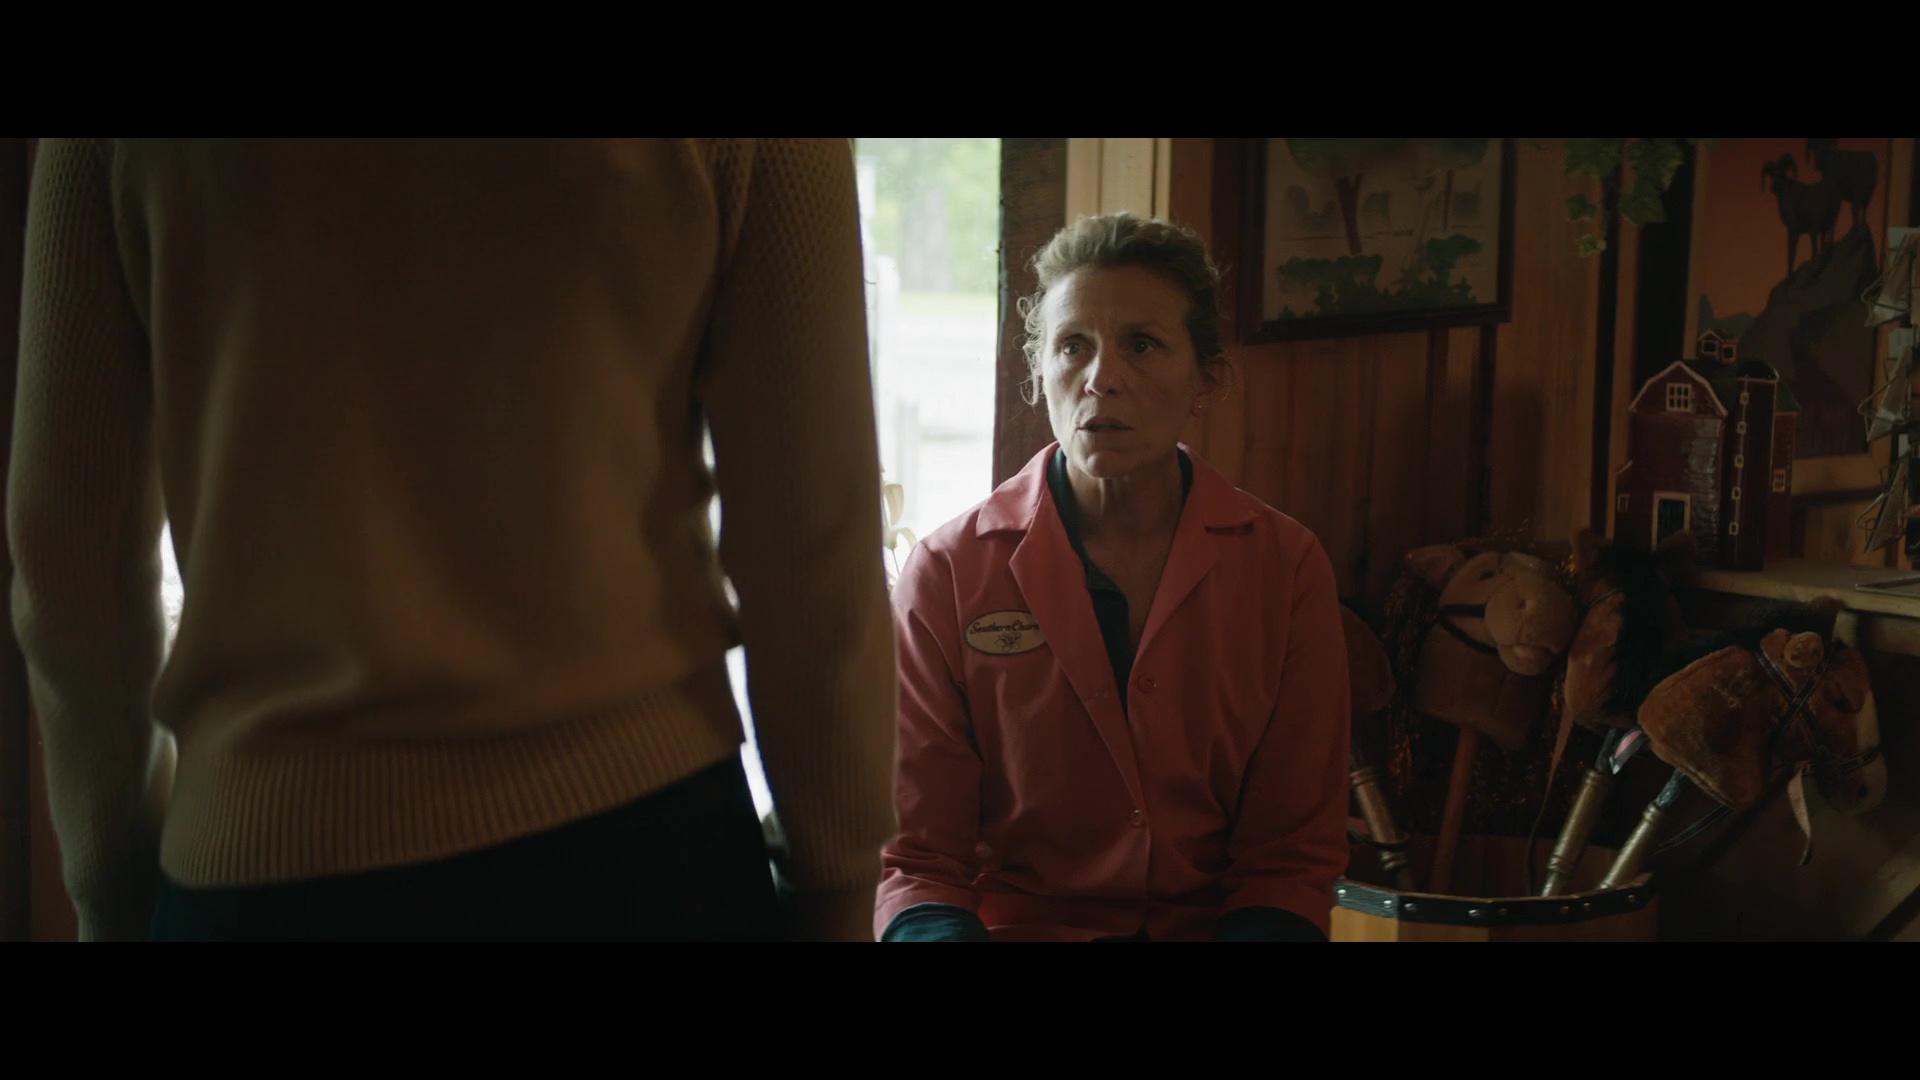 Tres Anuncios Por Un Crimen 1080p Lat-Cast-Ing[Crimen](2017)